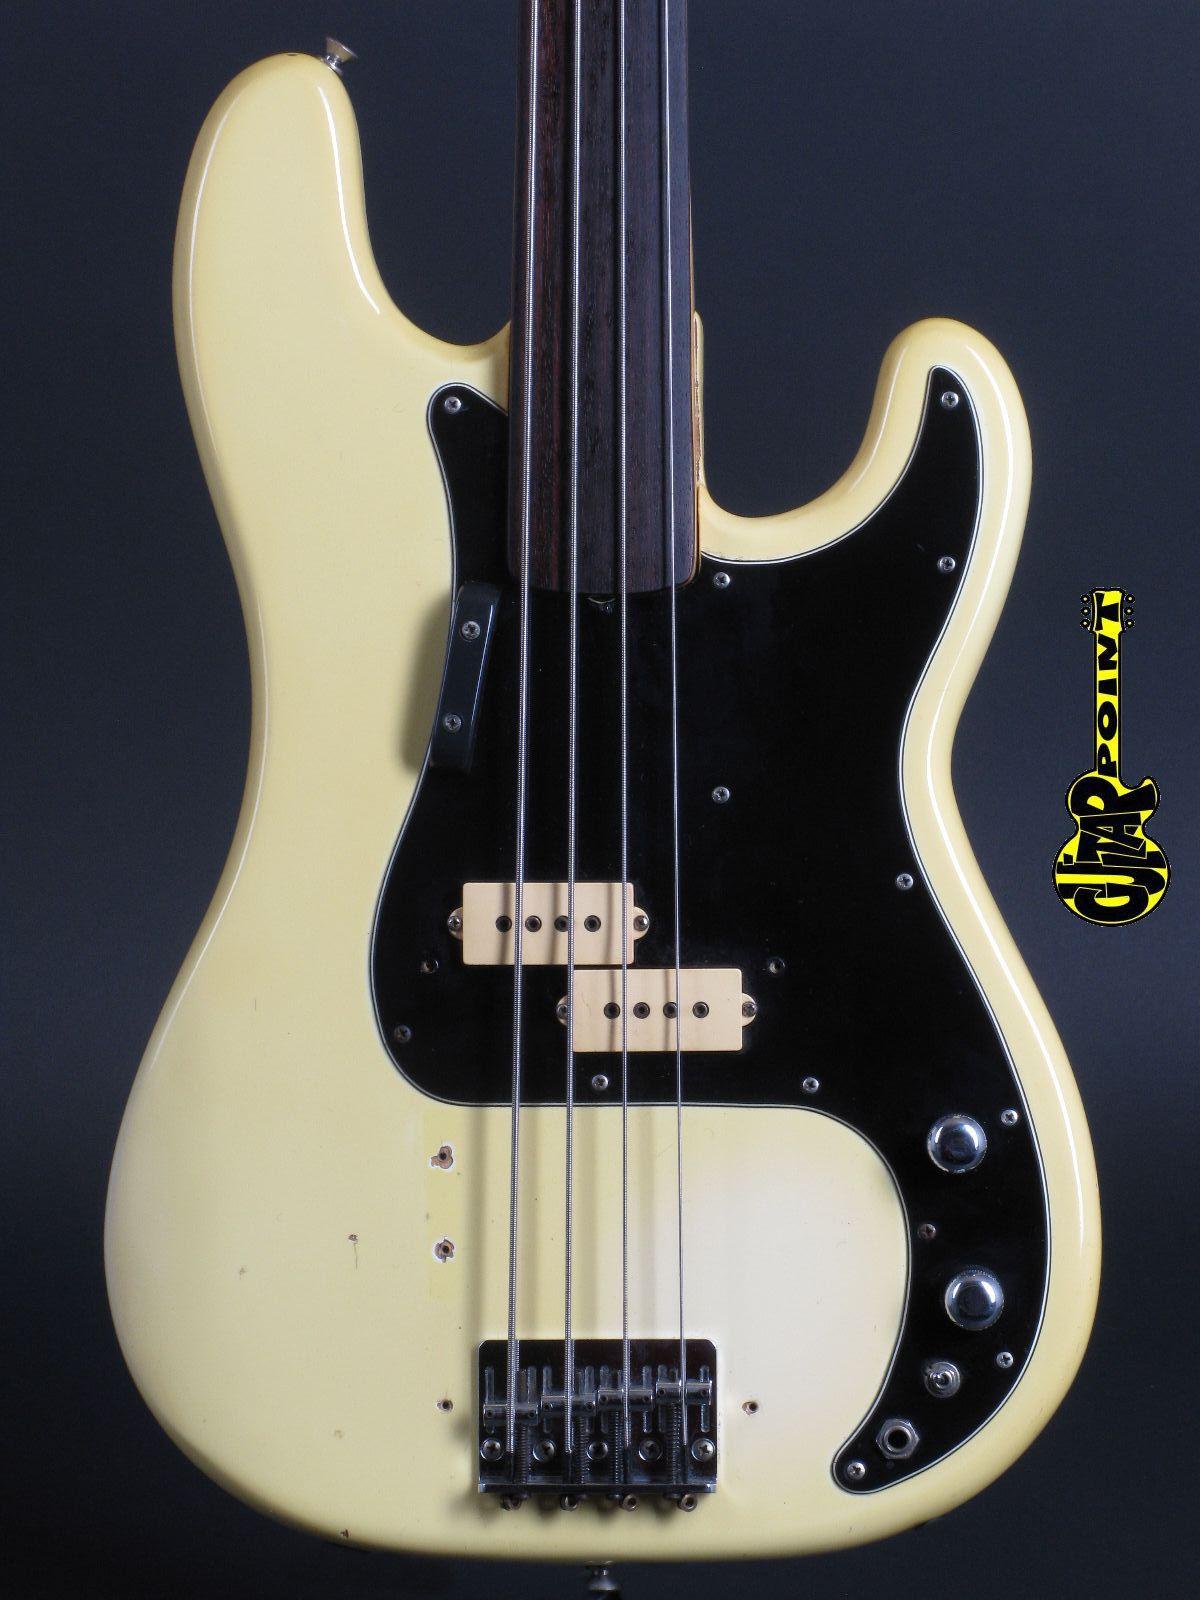 1978 Fender Precision Bass / Fretless - Olympic White